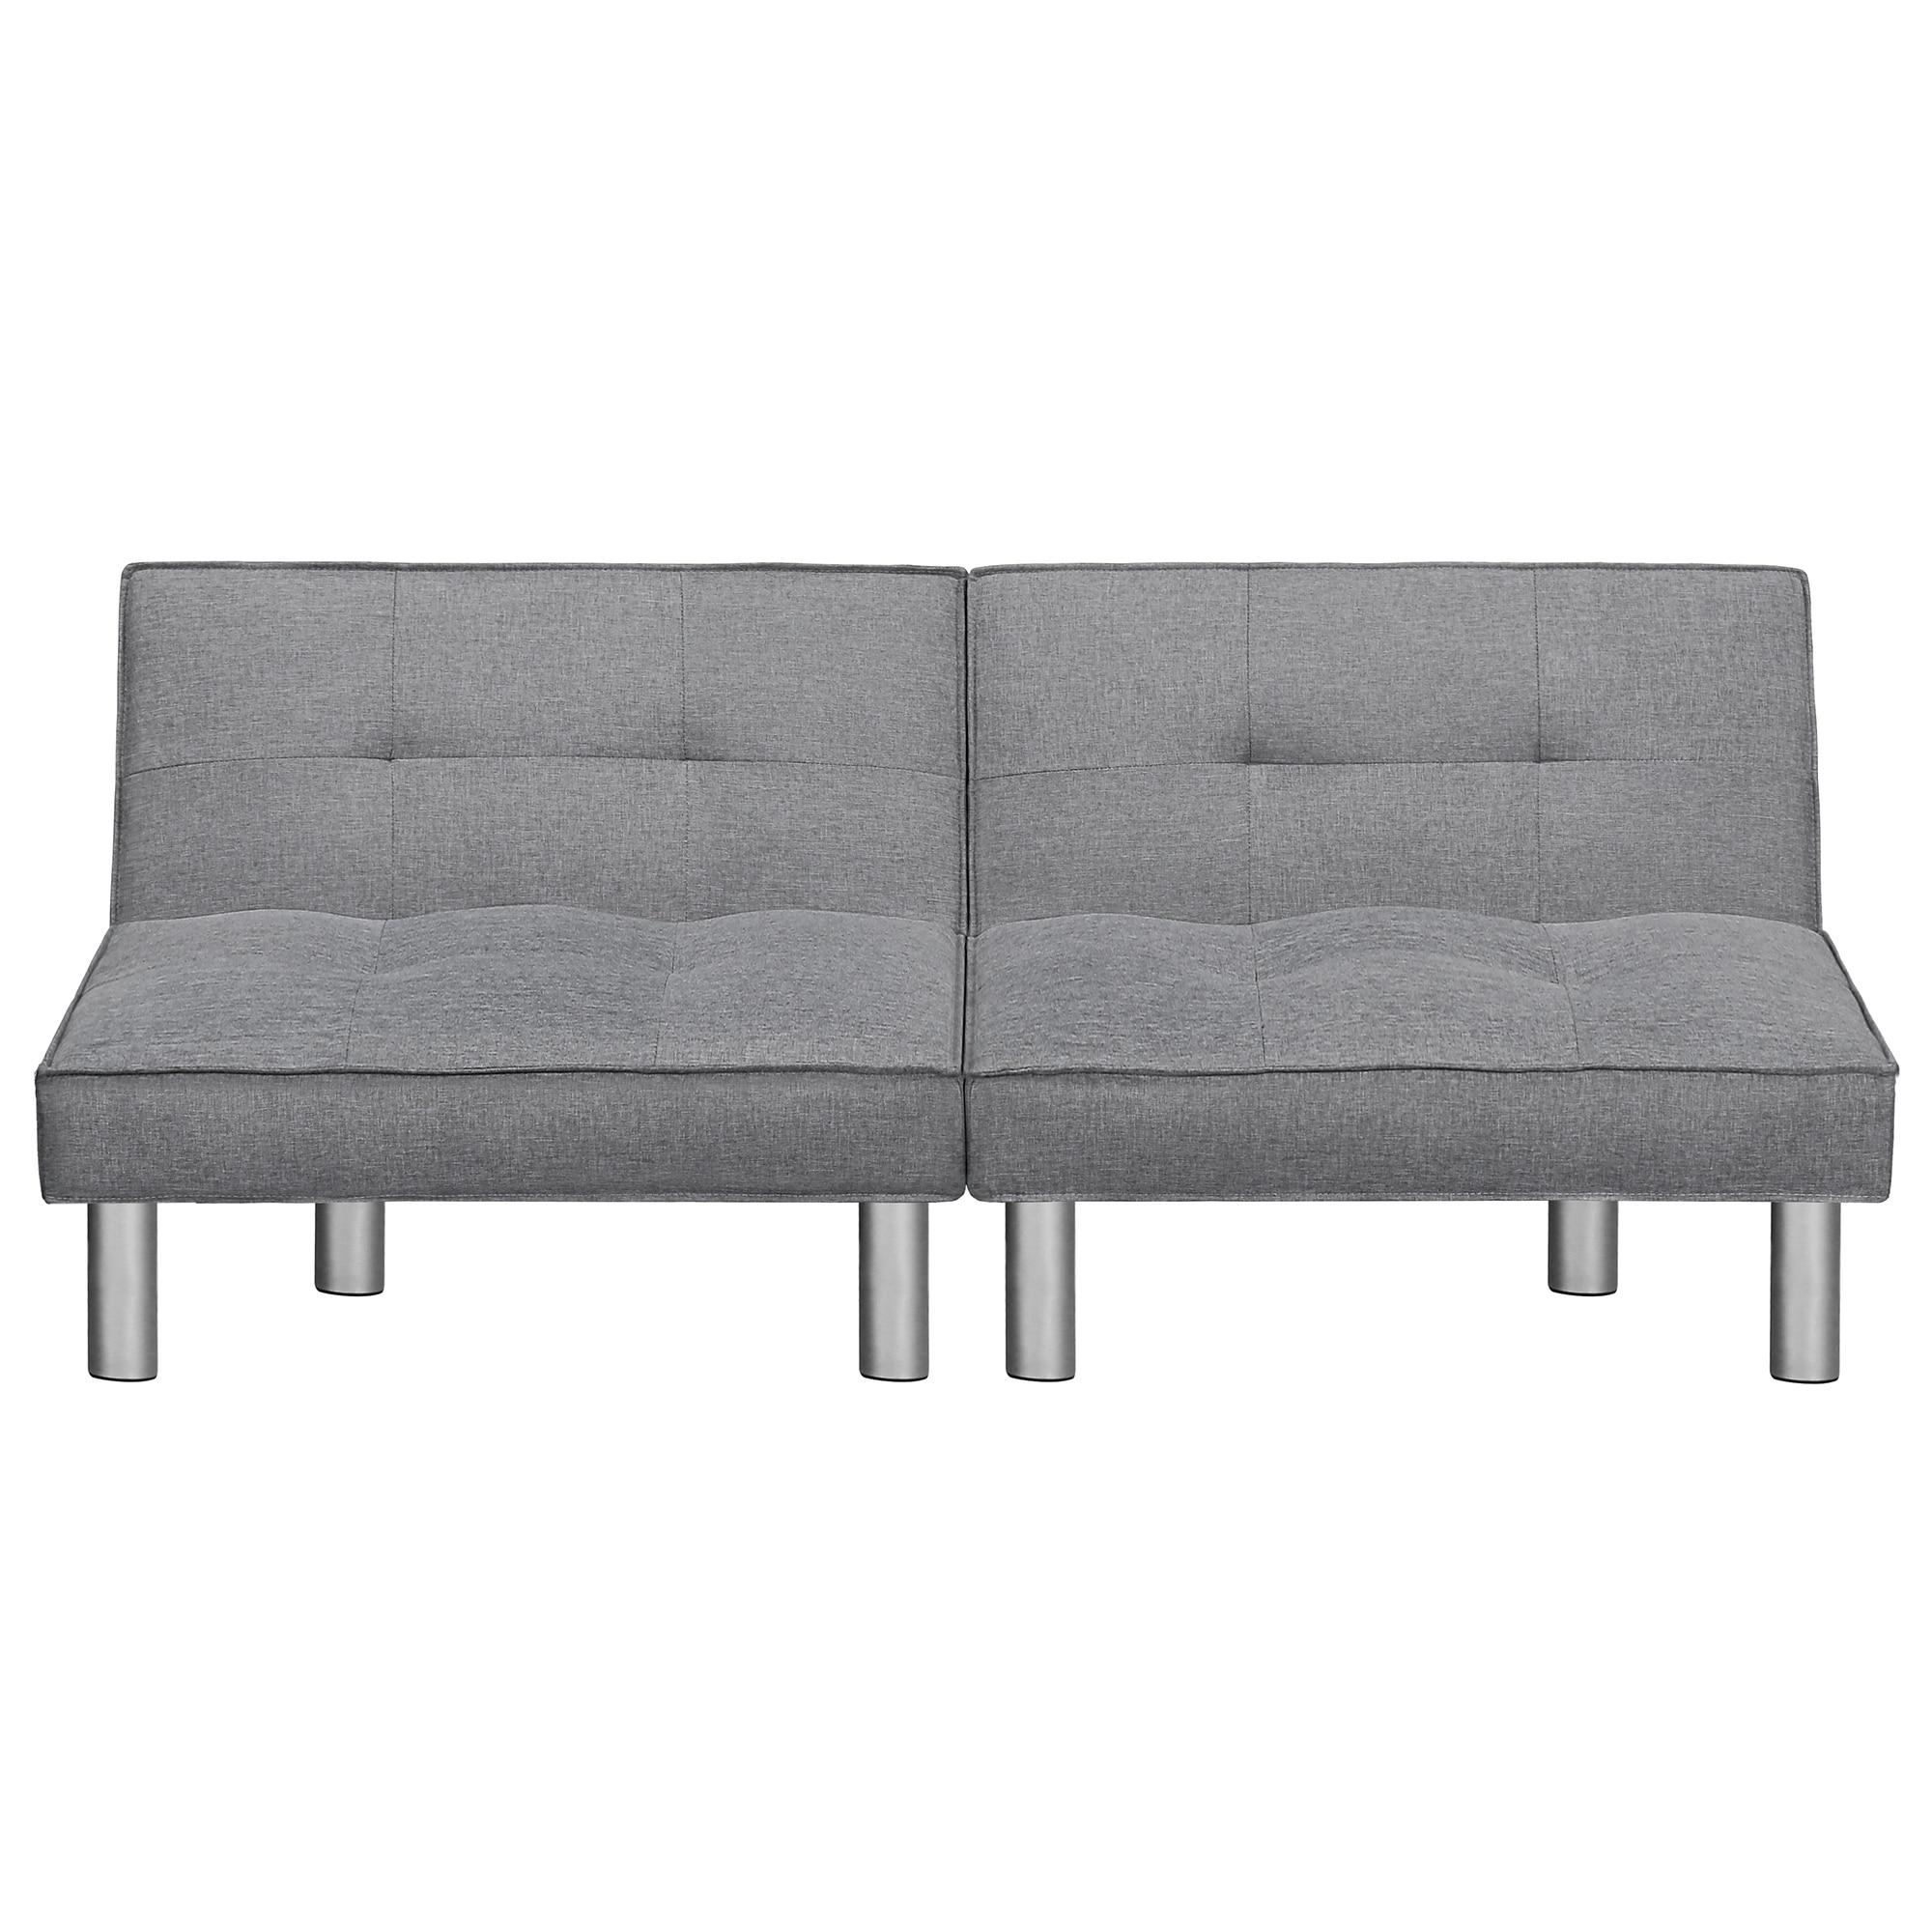 Sleeplanner Futon Sofa Bed With Microfiber Upholstery Grey